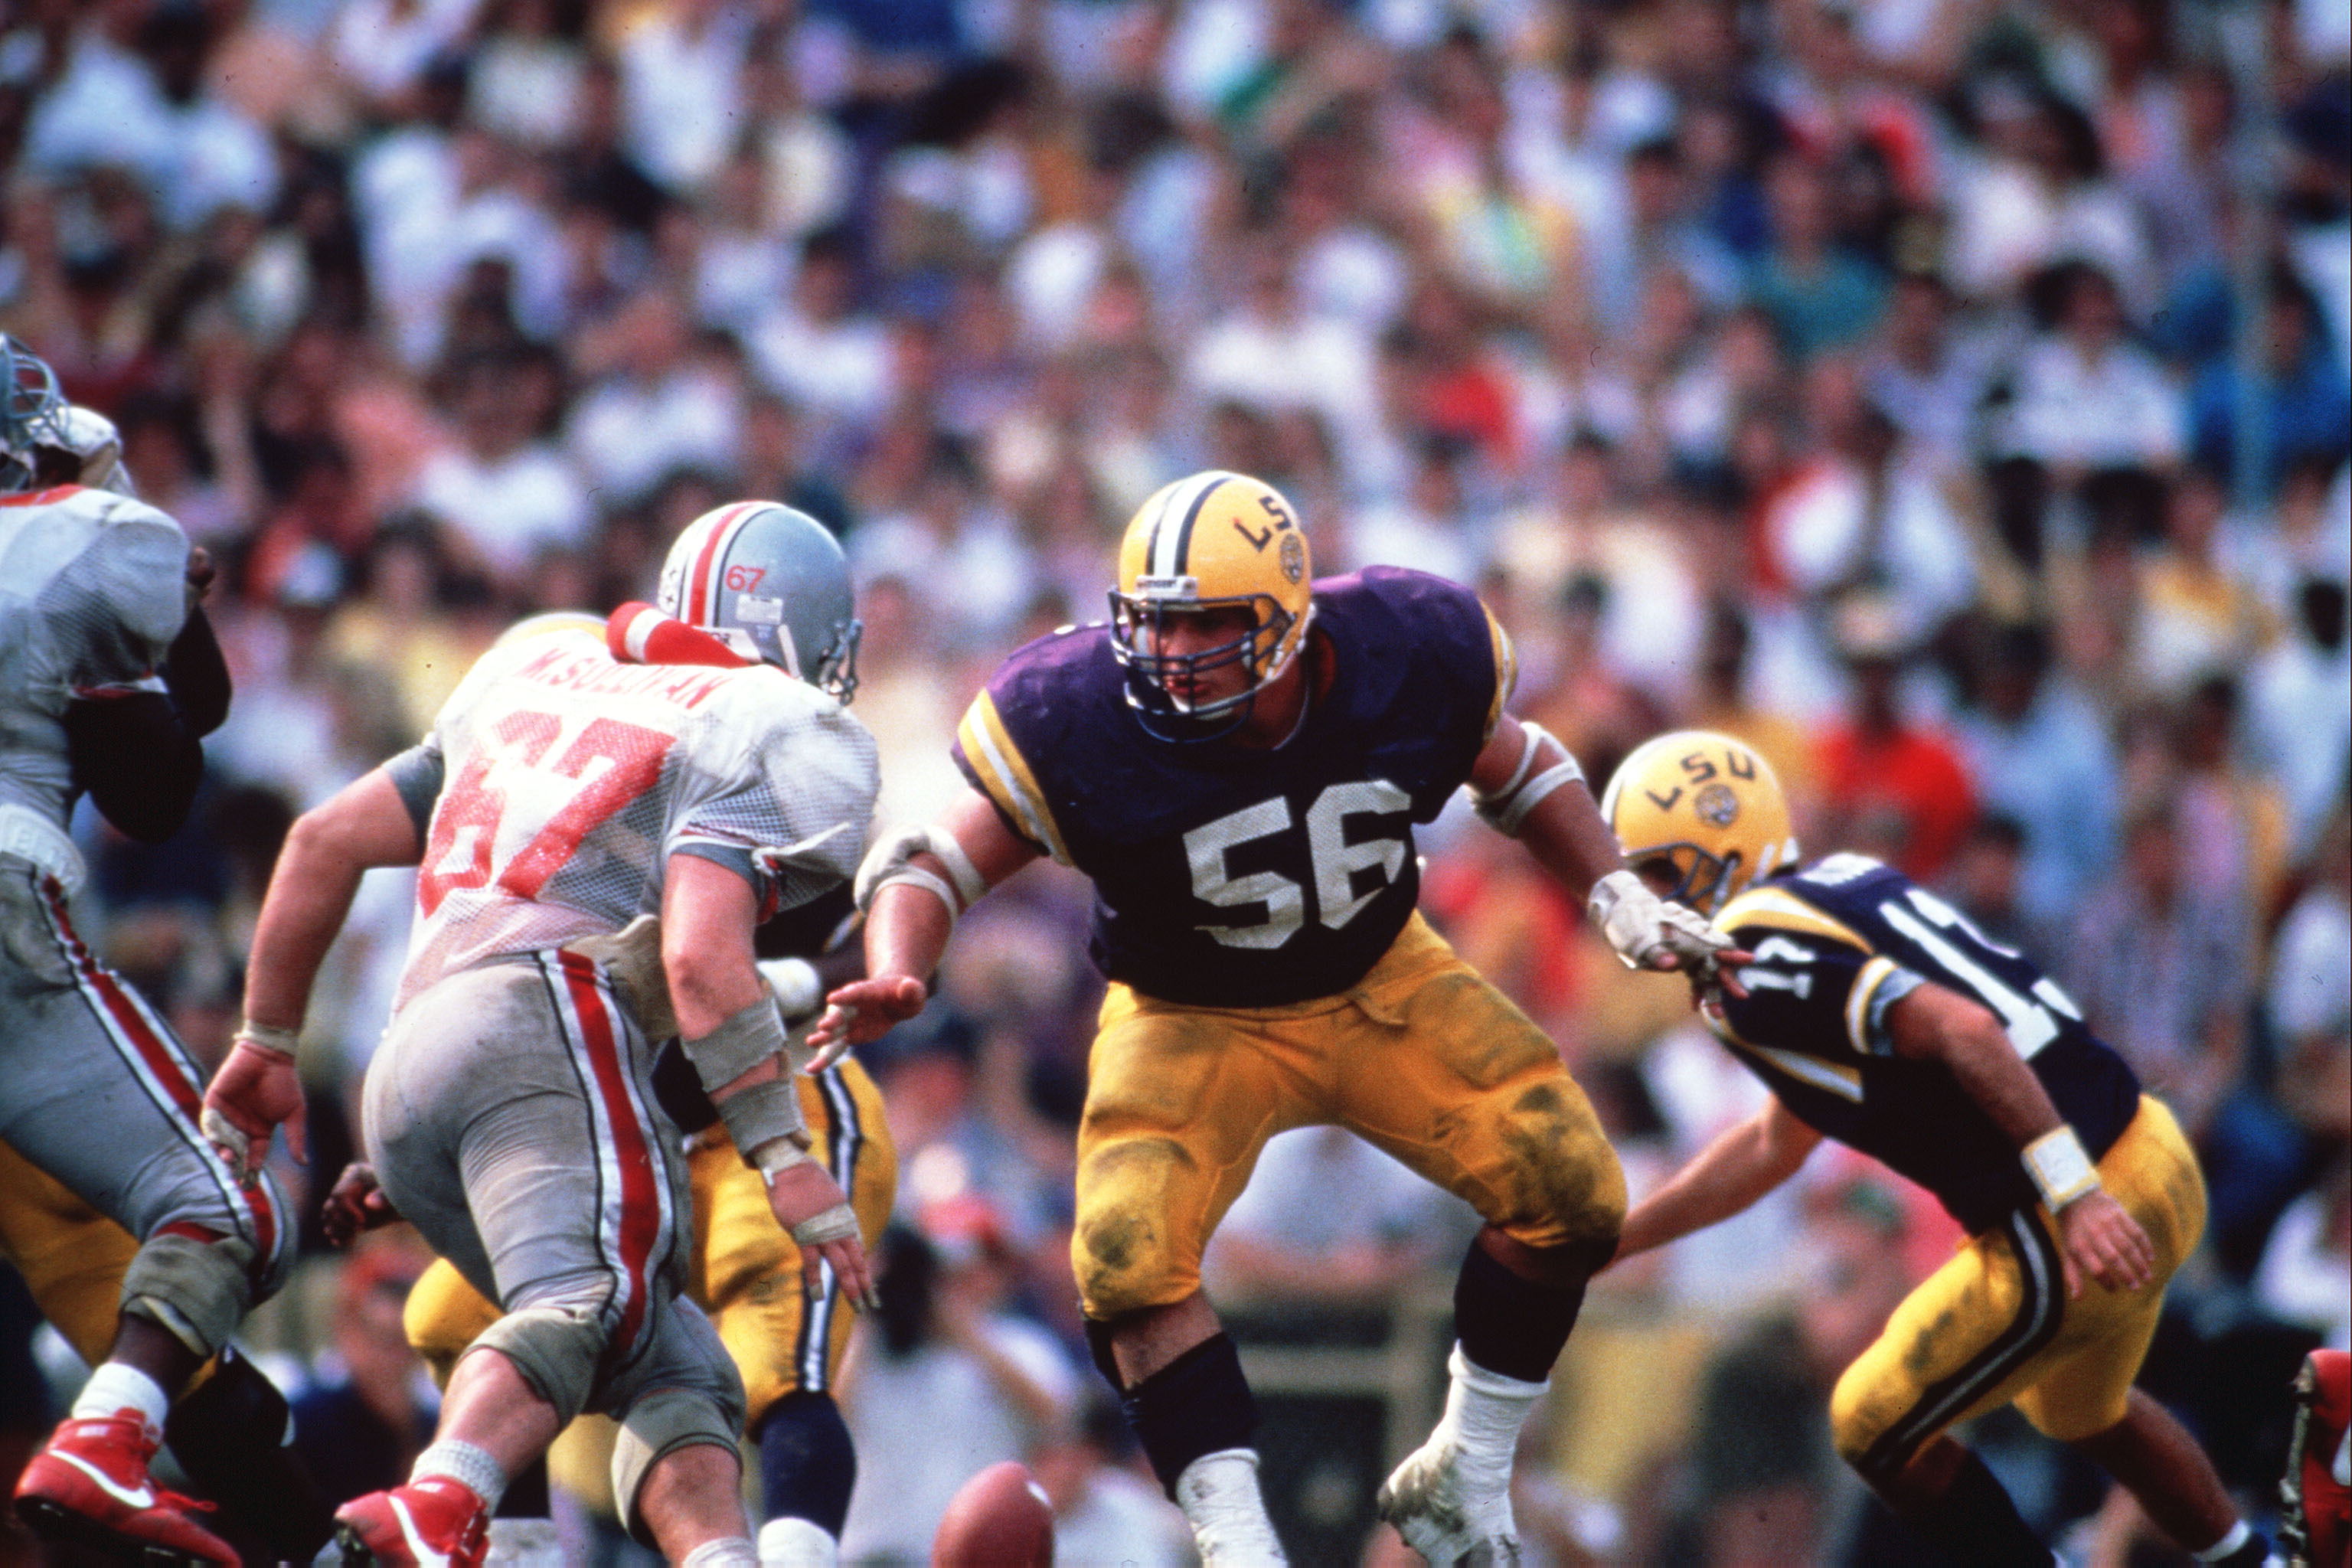 NOVEMBER 14, 1987: Nacho Albergamo #56 center of the Louisiana State University Tigers runs to make the block